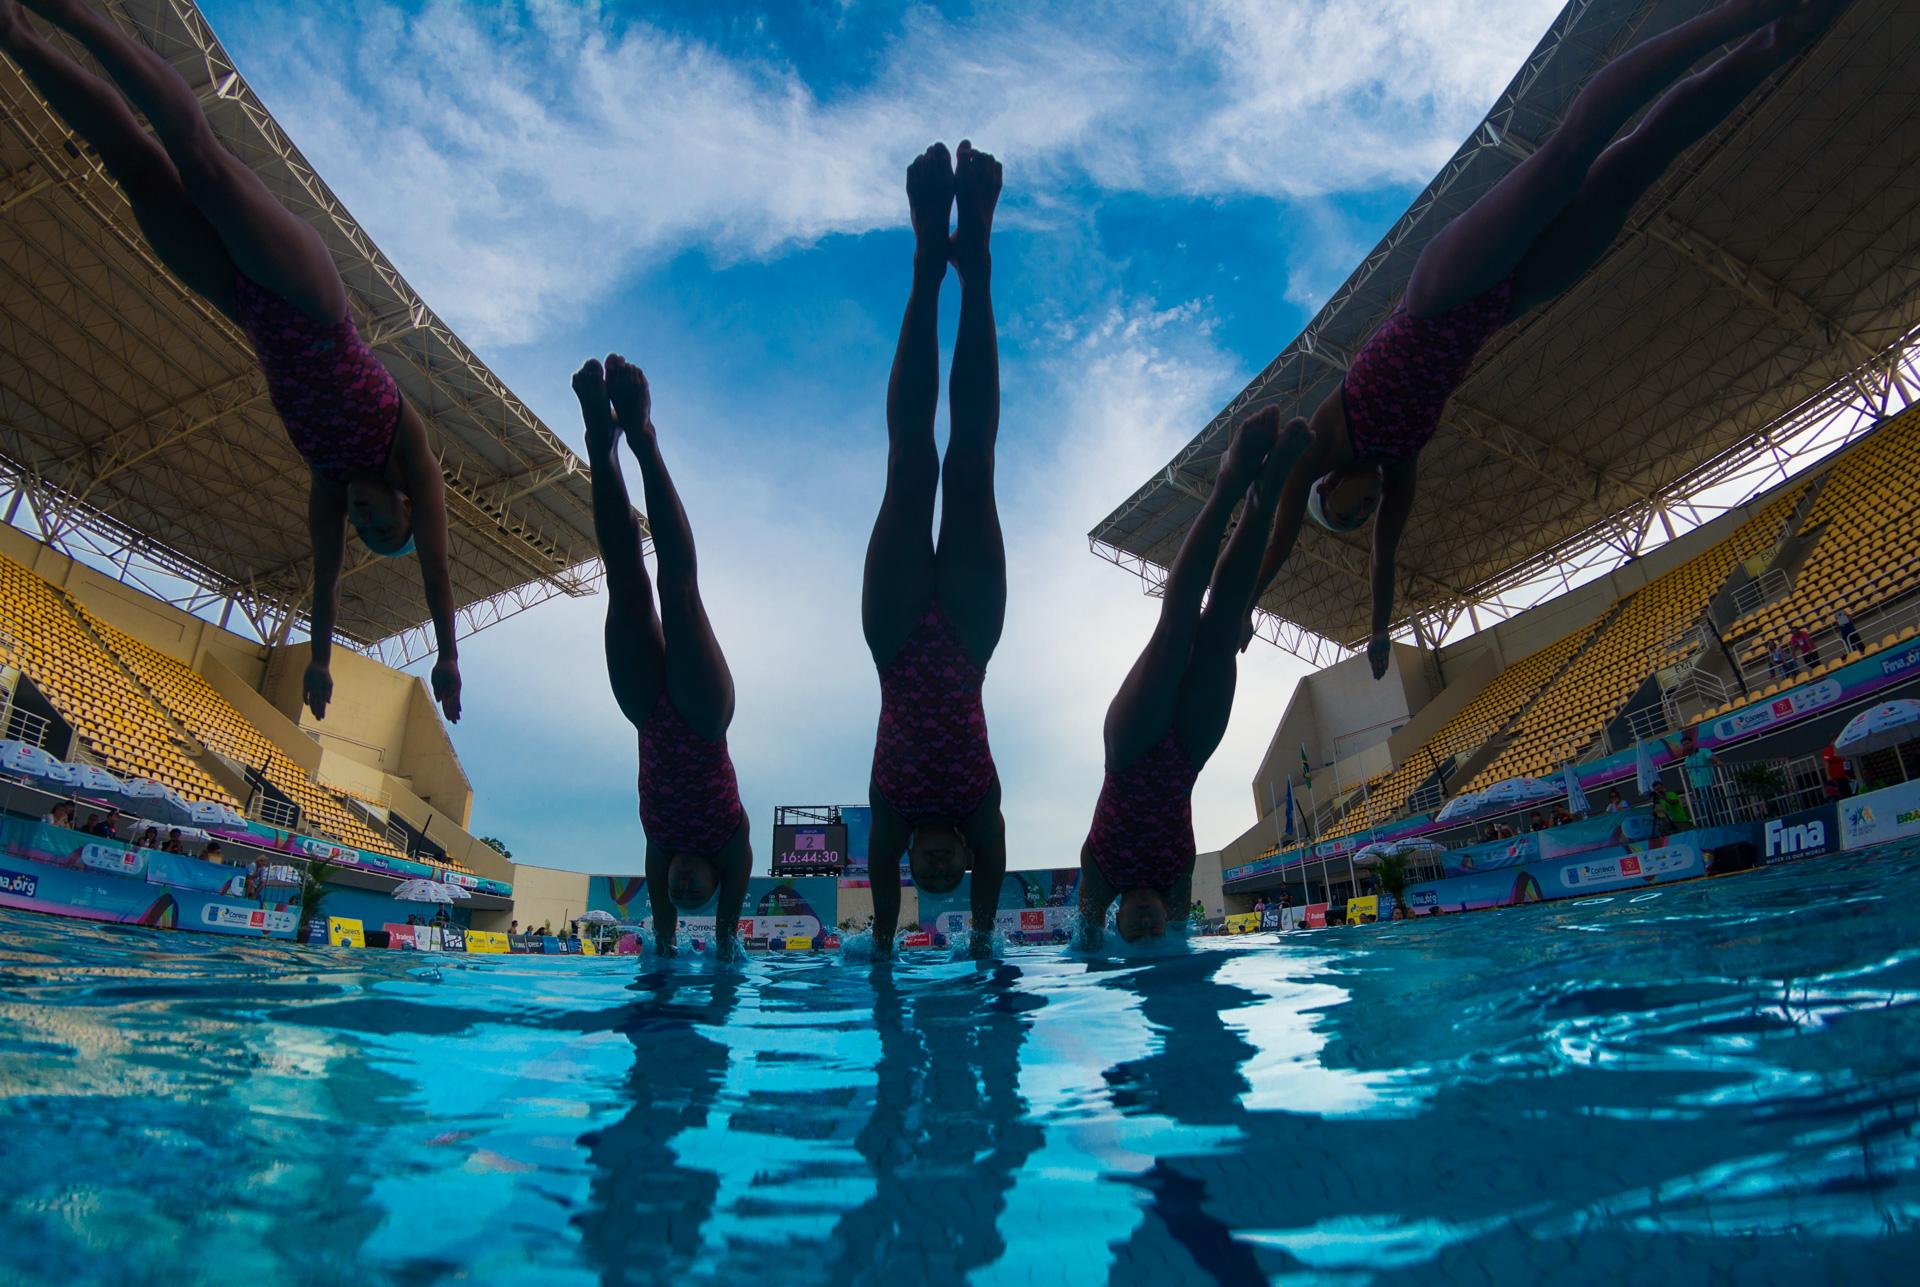 02/03/2016. Test-Event. Nado Sincronizado. Synchronised Swimming